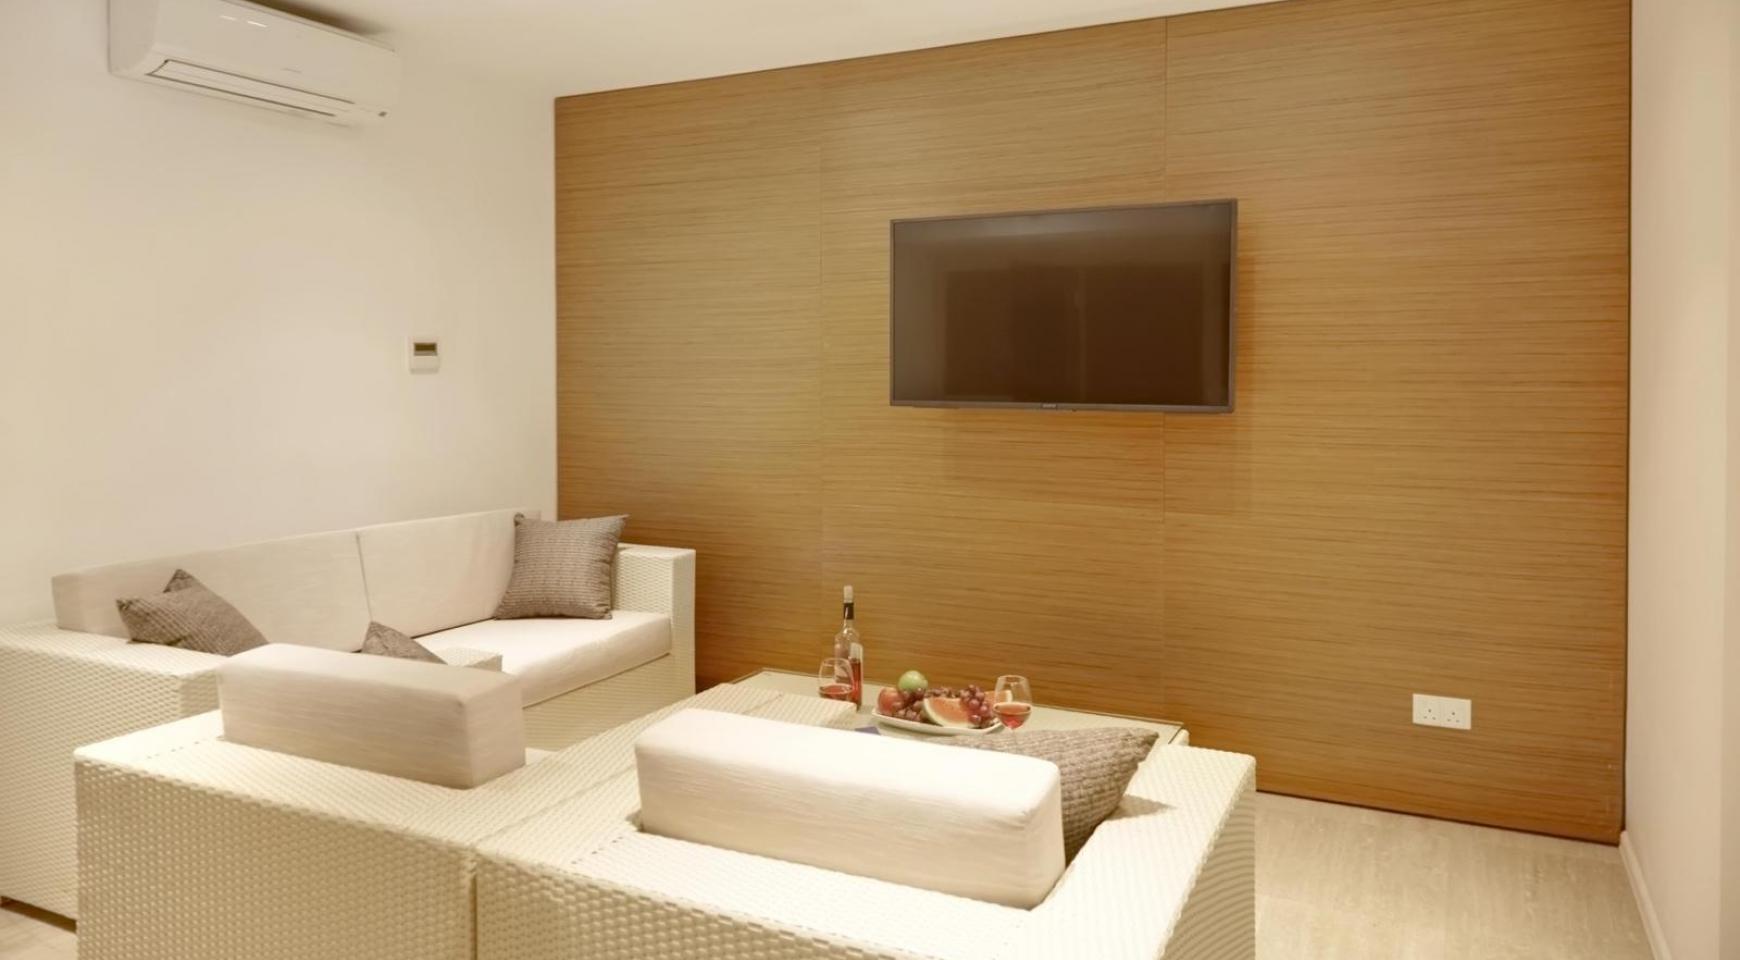 New Luxurious 4 Bedroom Villa in the Tourist Area - 41